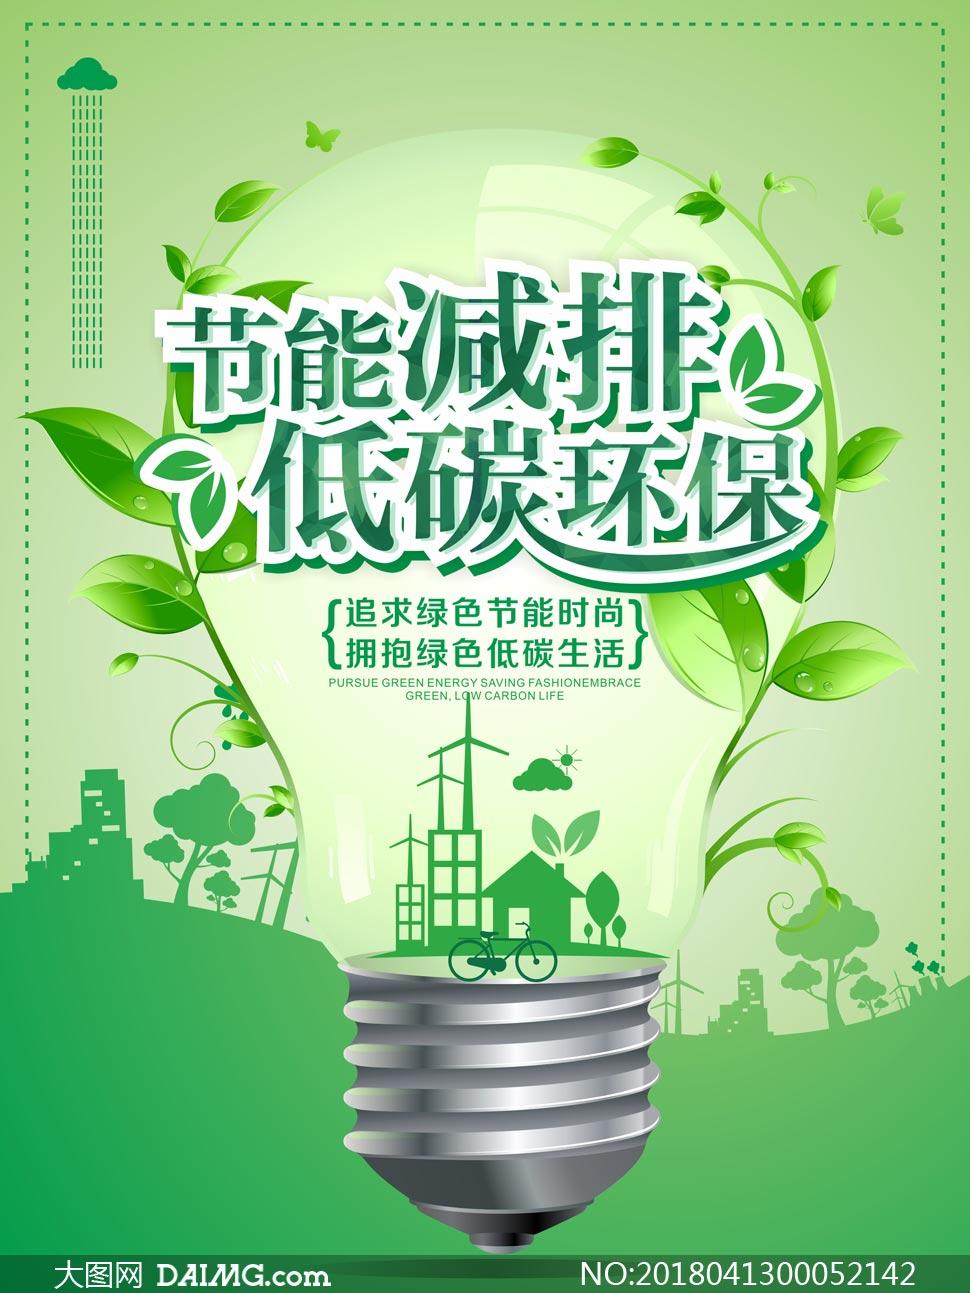 cdr14 关 键 词: 公益海报公益宣传节能减排低碳环保低碳生活绿色主题